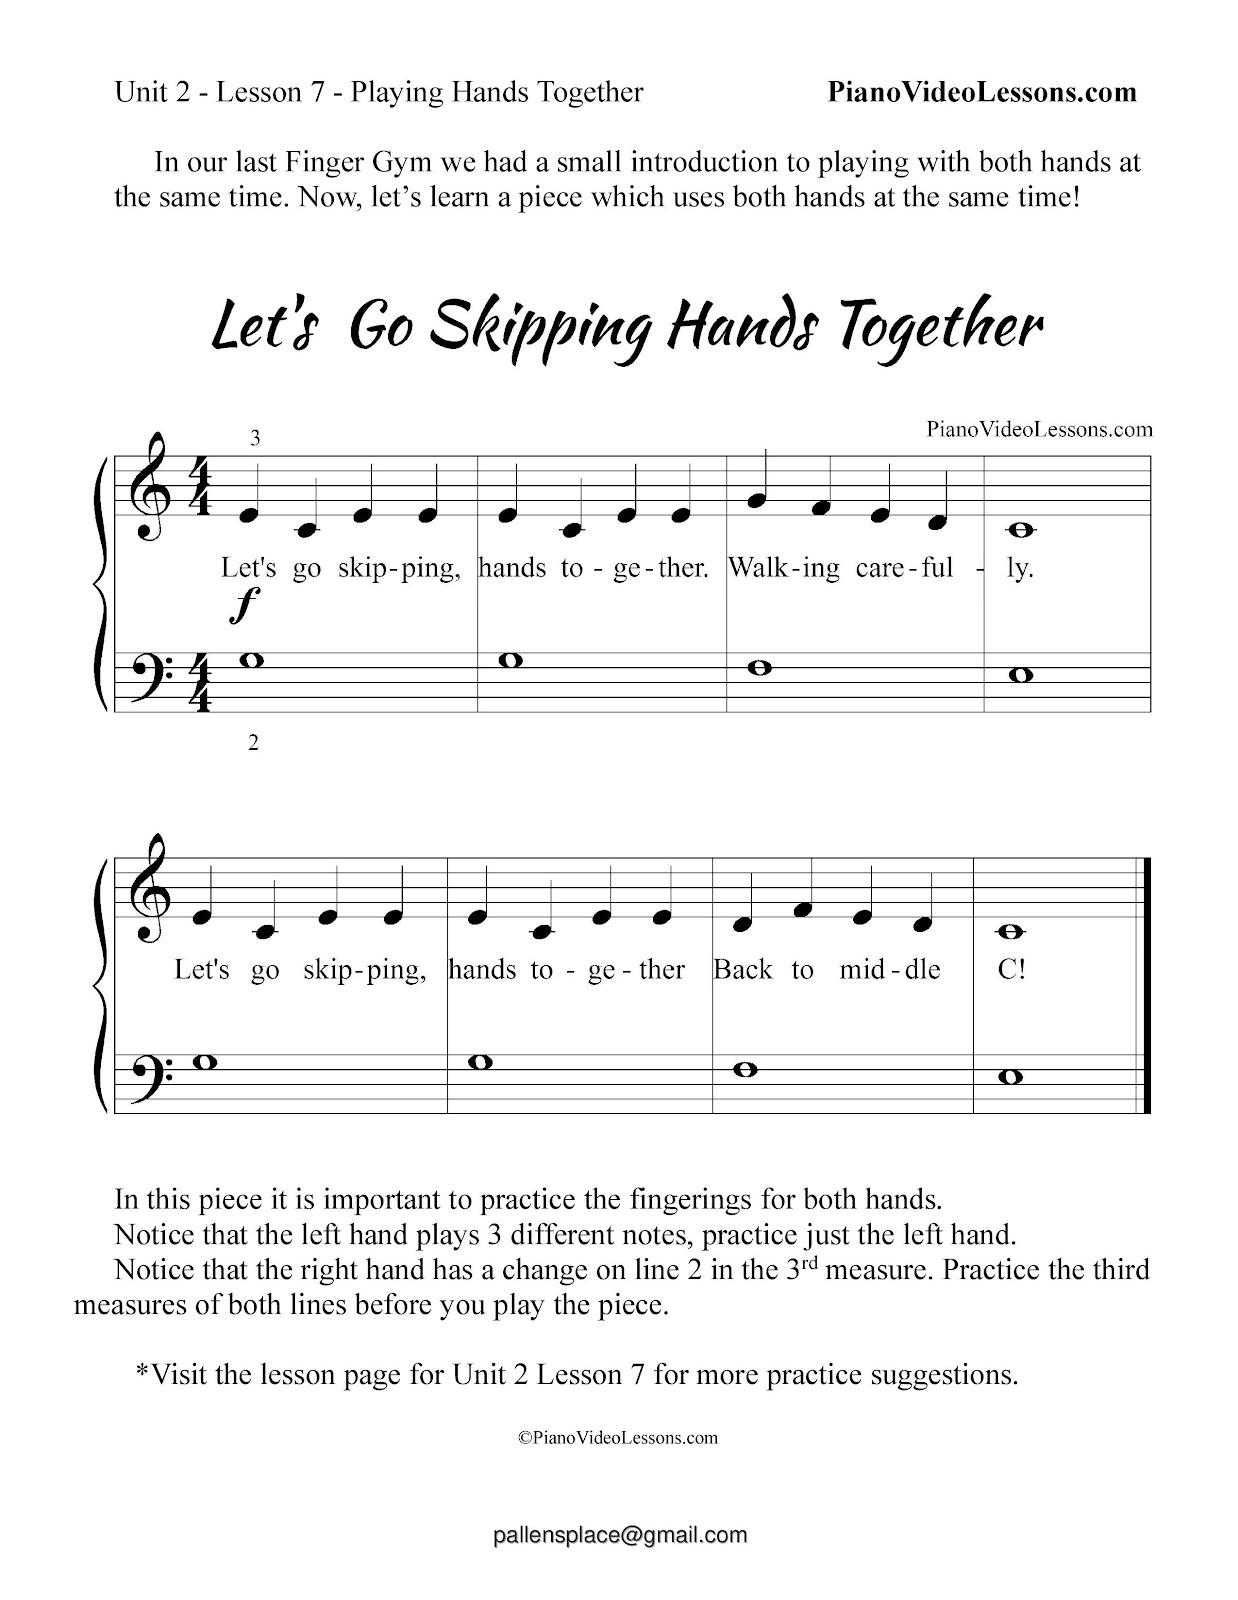 Let's Go Skipping Hands Togather.jpg